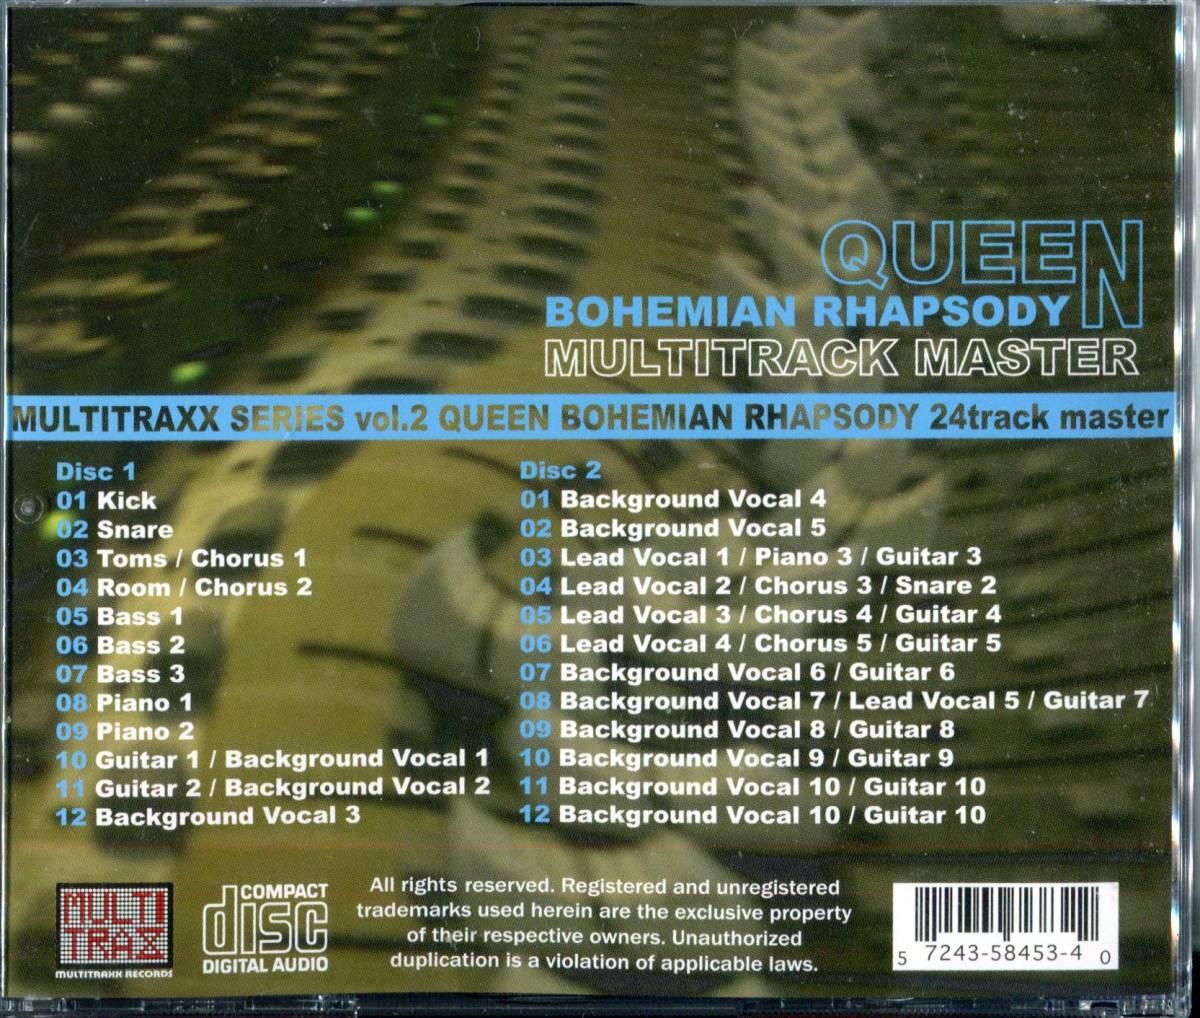 代購代標第一品牌- 樂淘letao - □2cd bohemian rhapsody multitrack